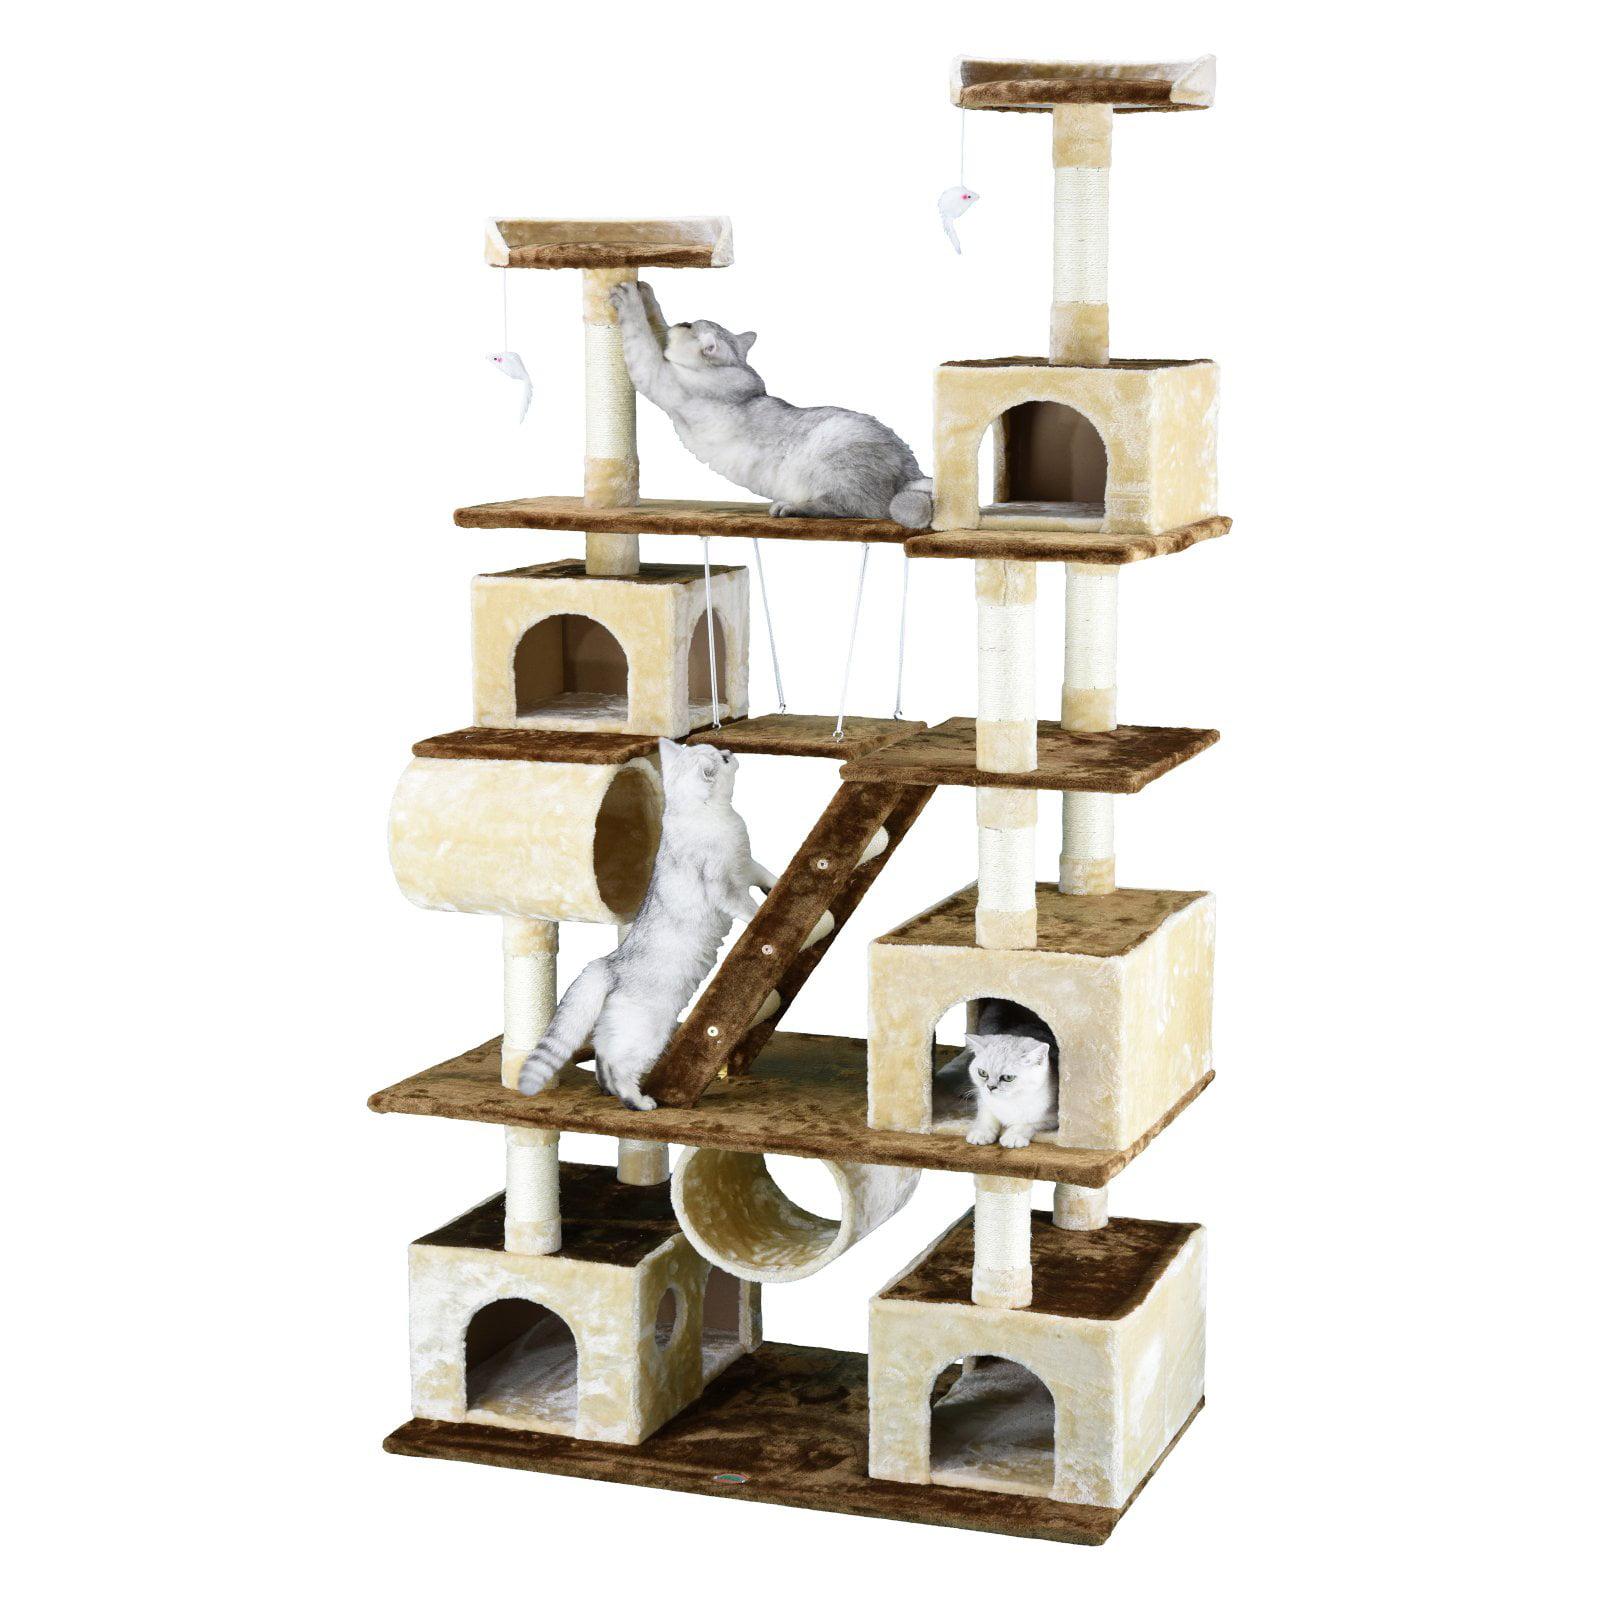 Go Pet Club Huge 87.5 in. Cat Tree Condo House Furniture by Go Pet Club LLC